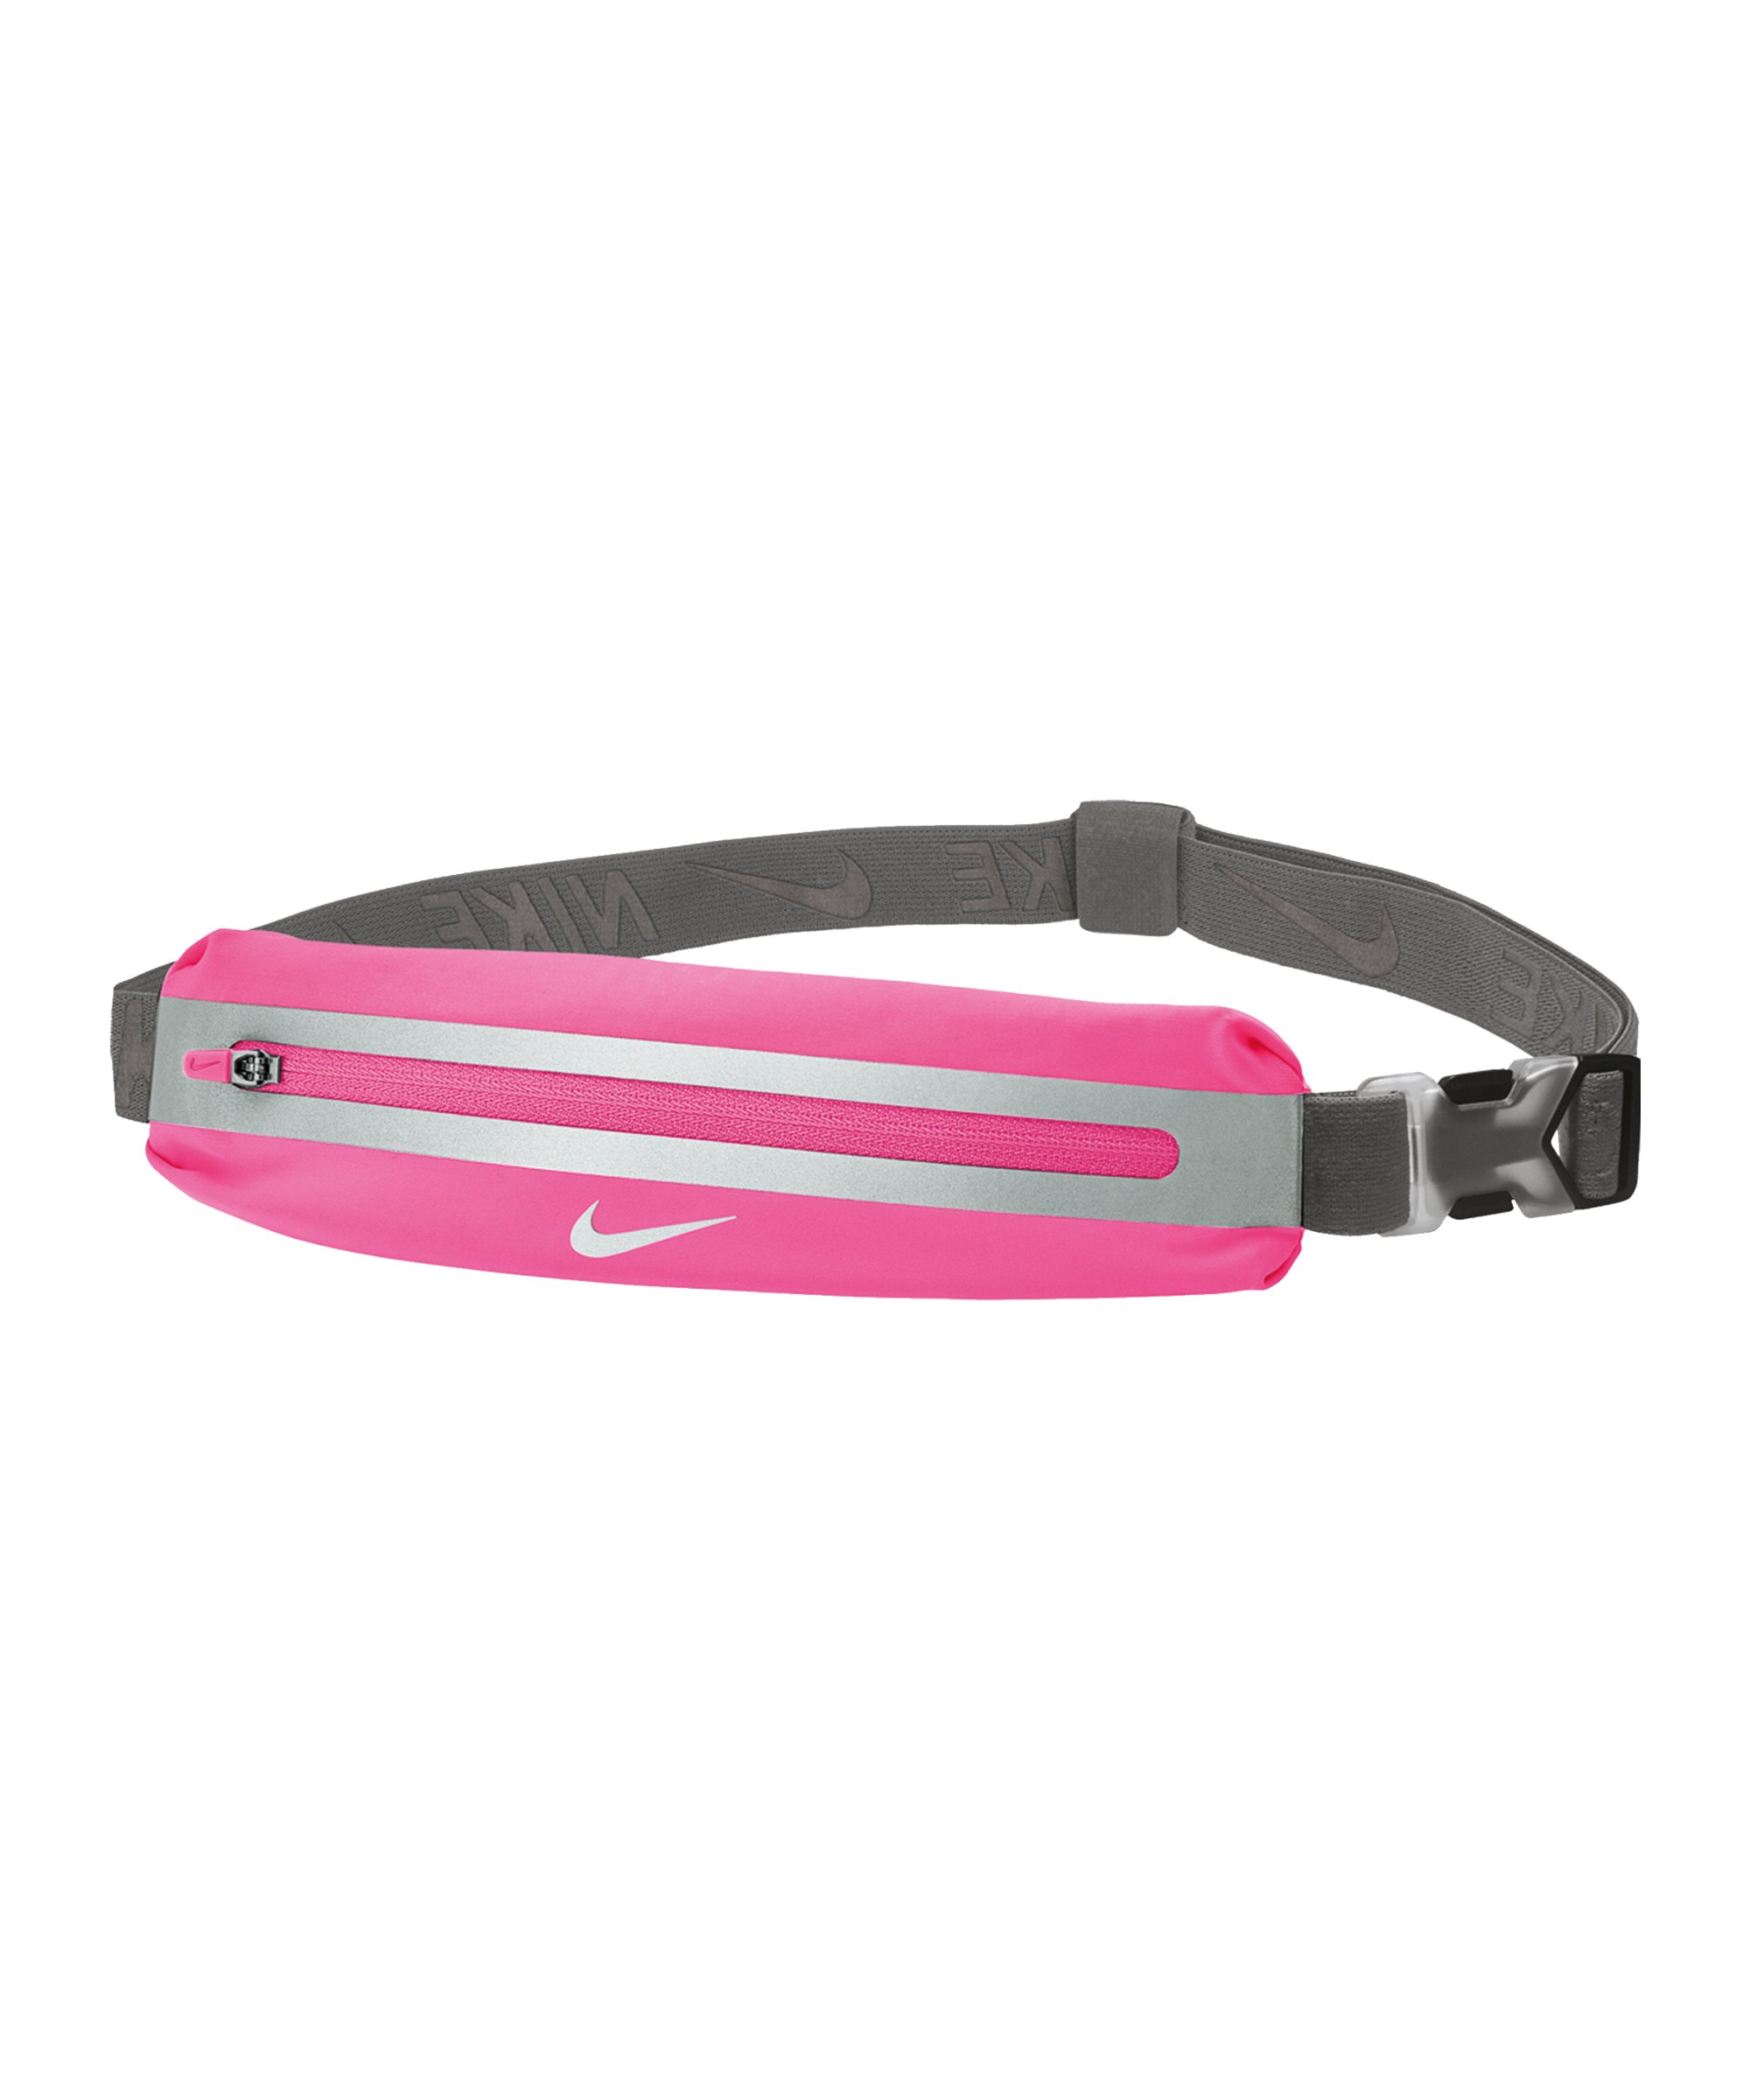 Nike Slim Waistpack 2.0 Hüfttasche Pink Grau F688 - pink